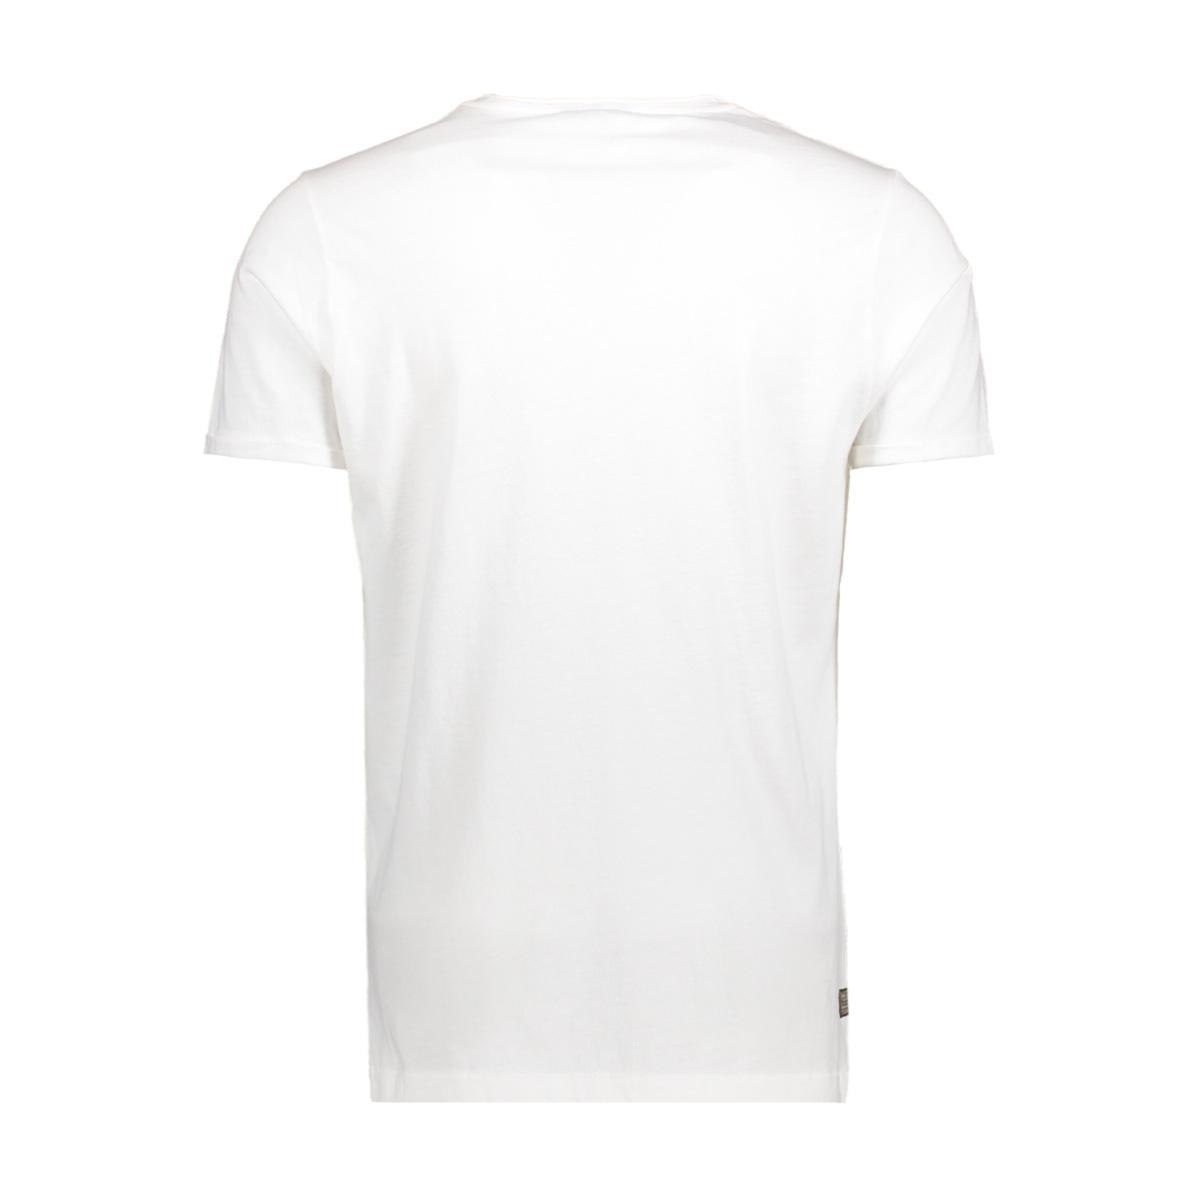 ptss184571 pme legend t-shirt 7072